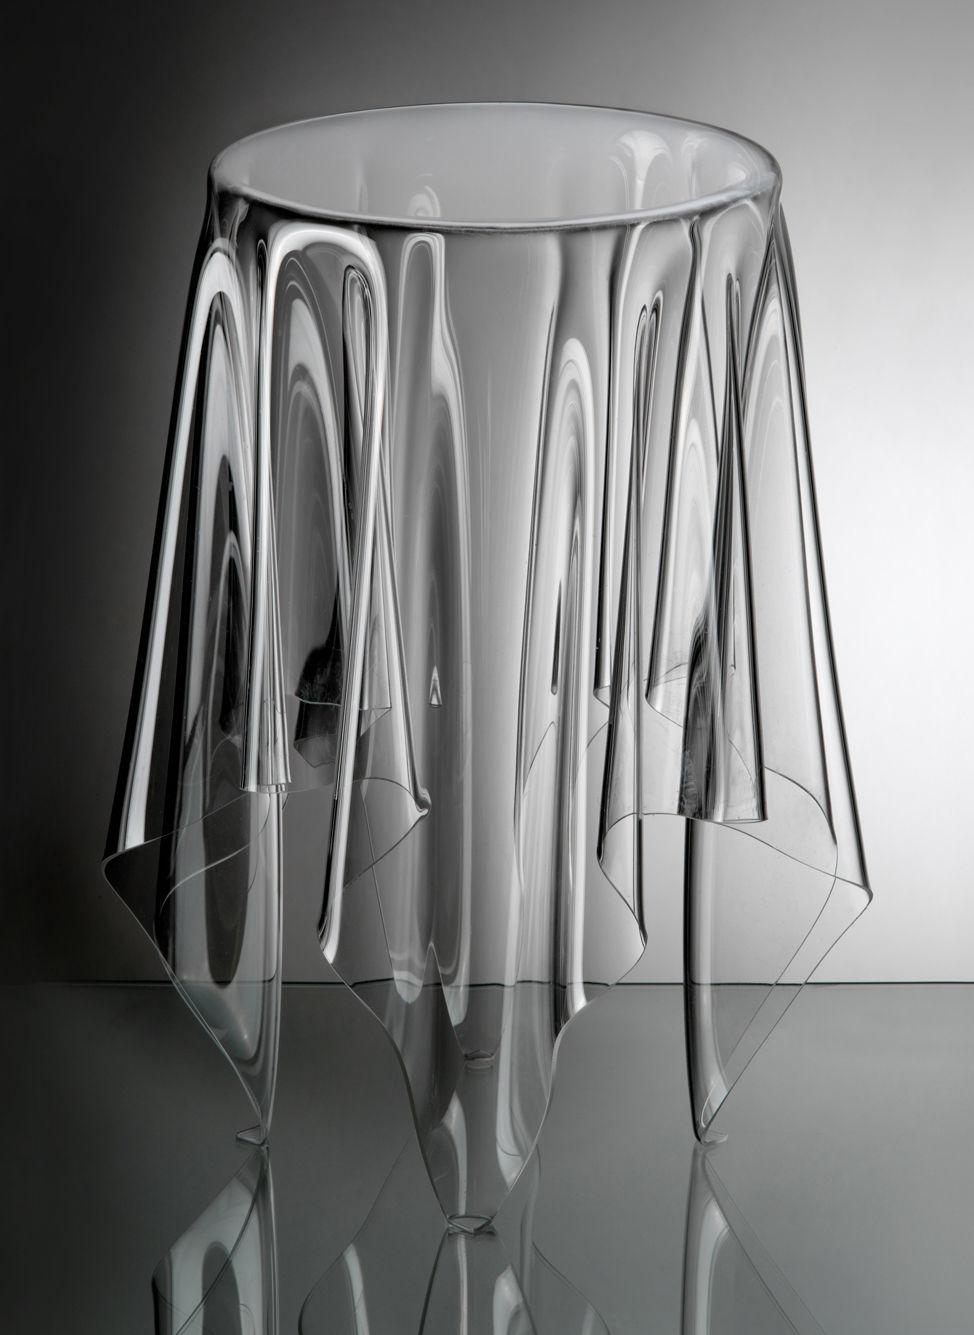 Tall Illusion Coffee Table H 56 X 32 Cm H 56 X 32 Cm